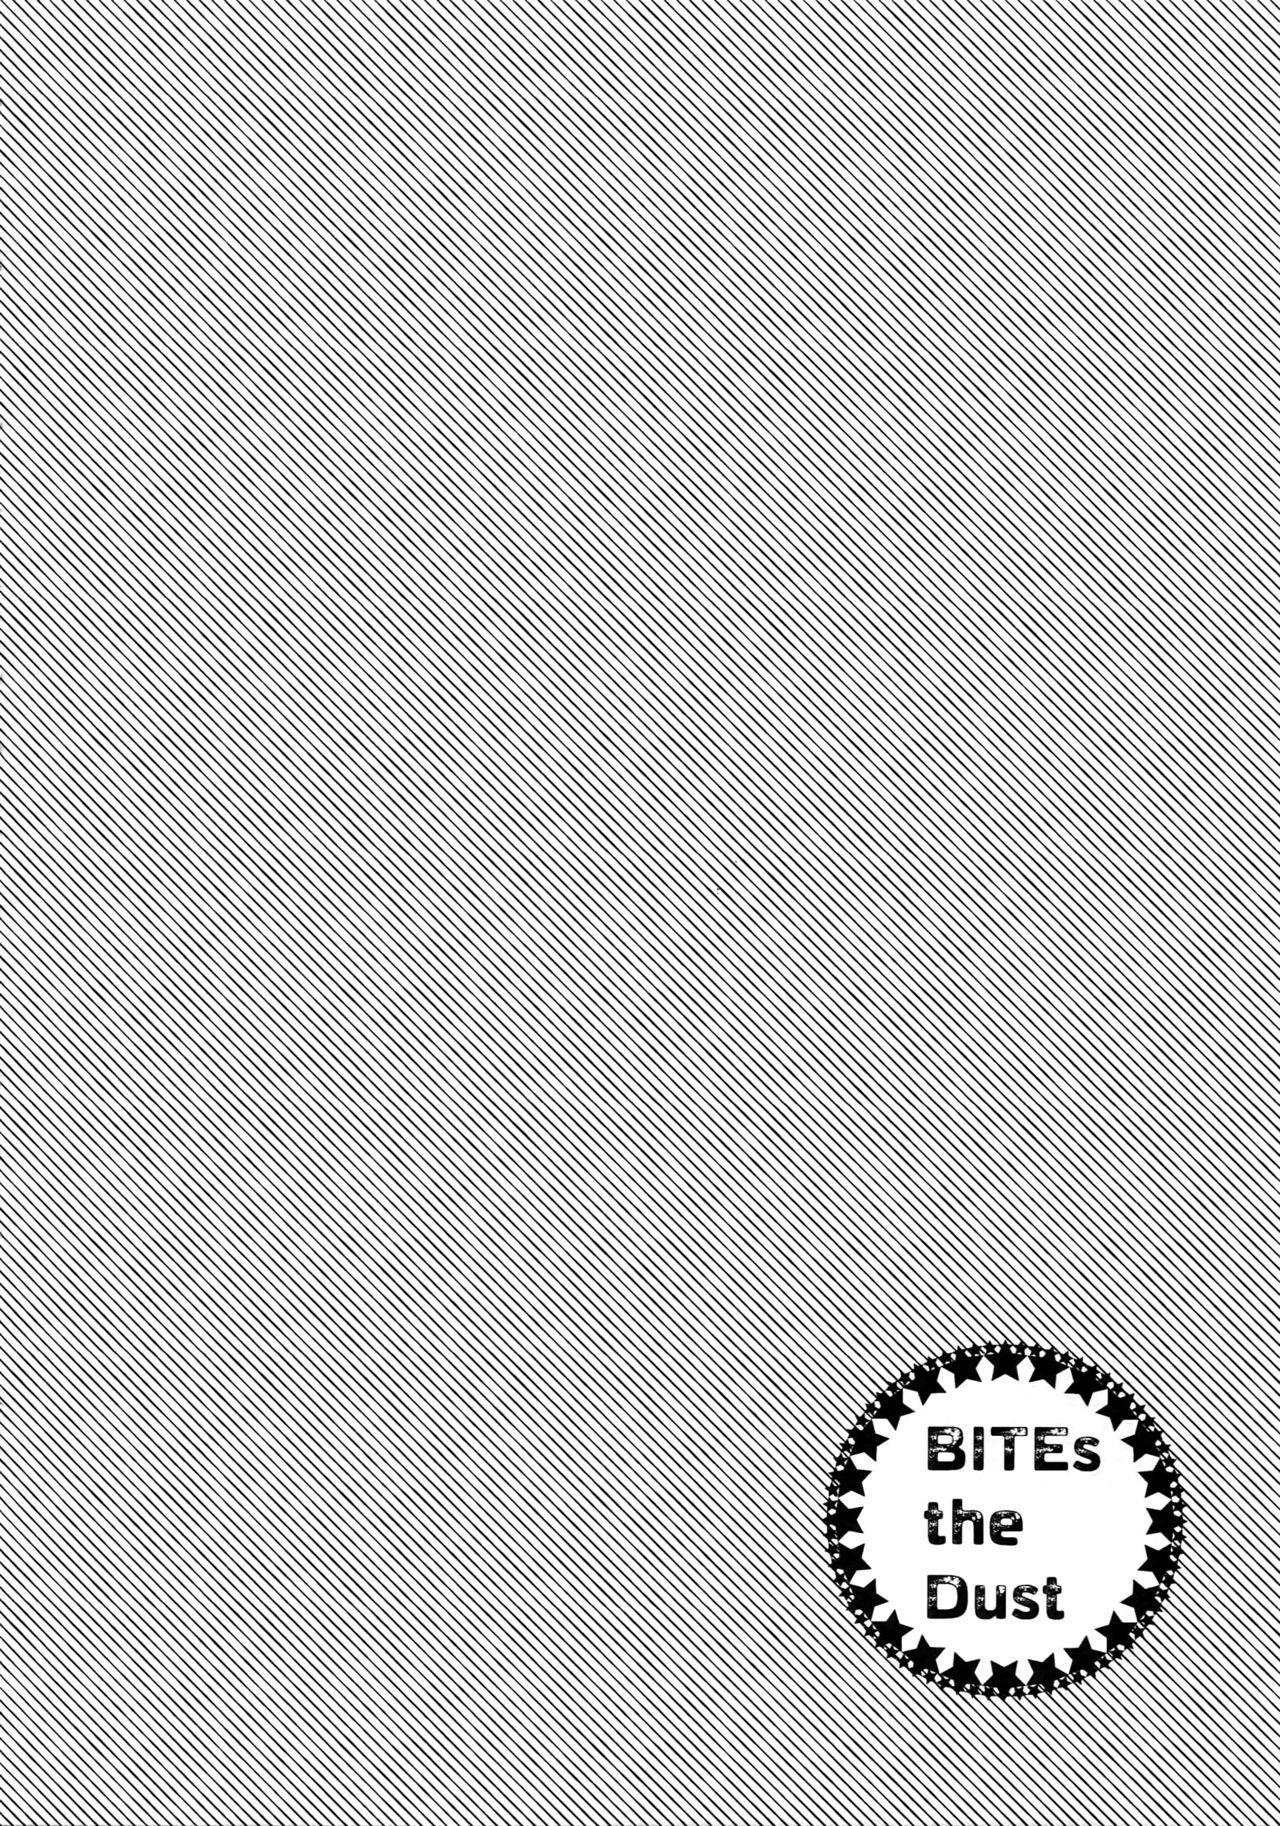 BITEs the Dust 99